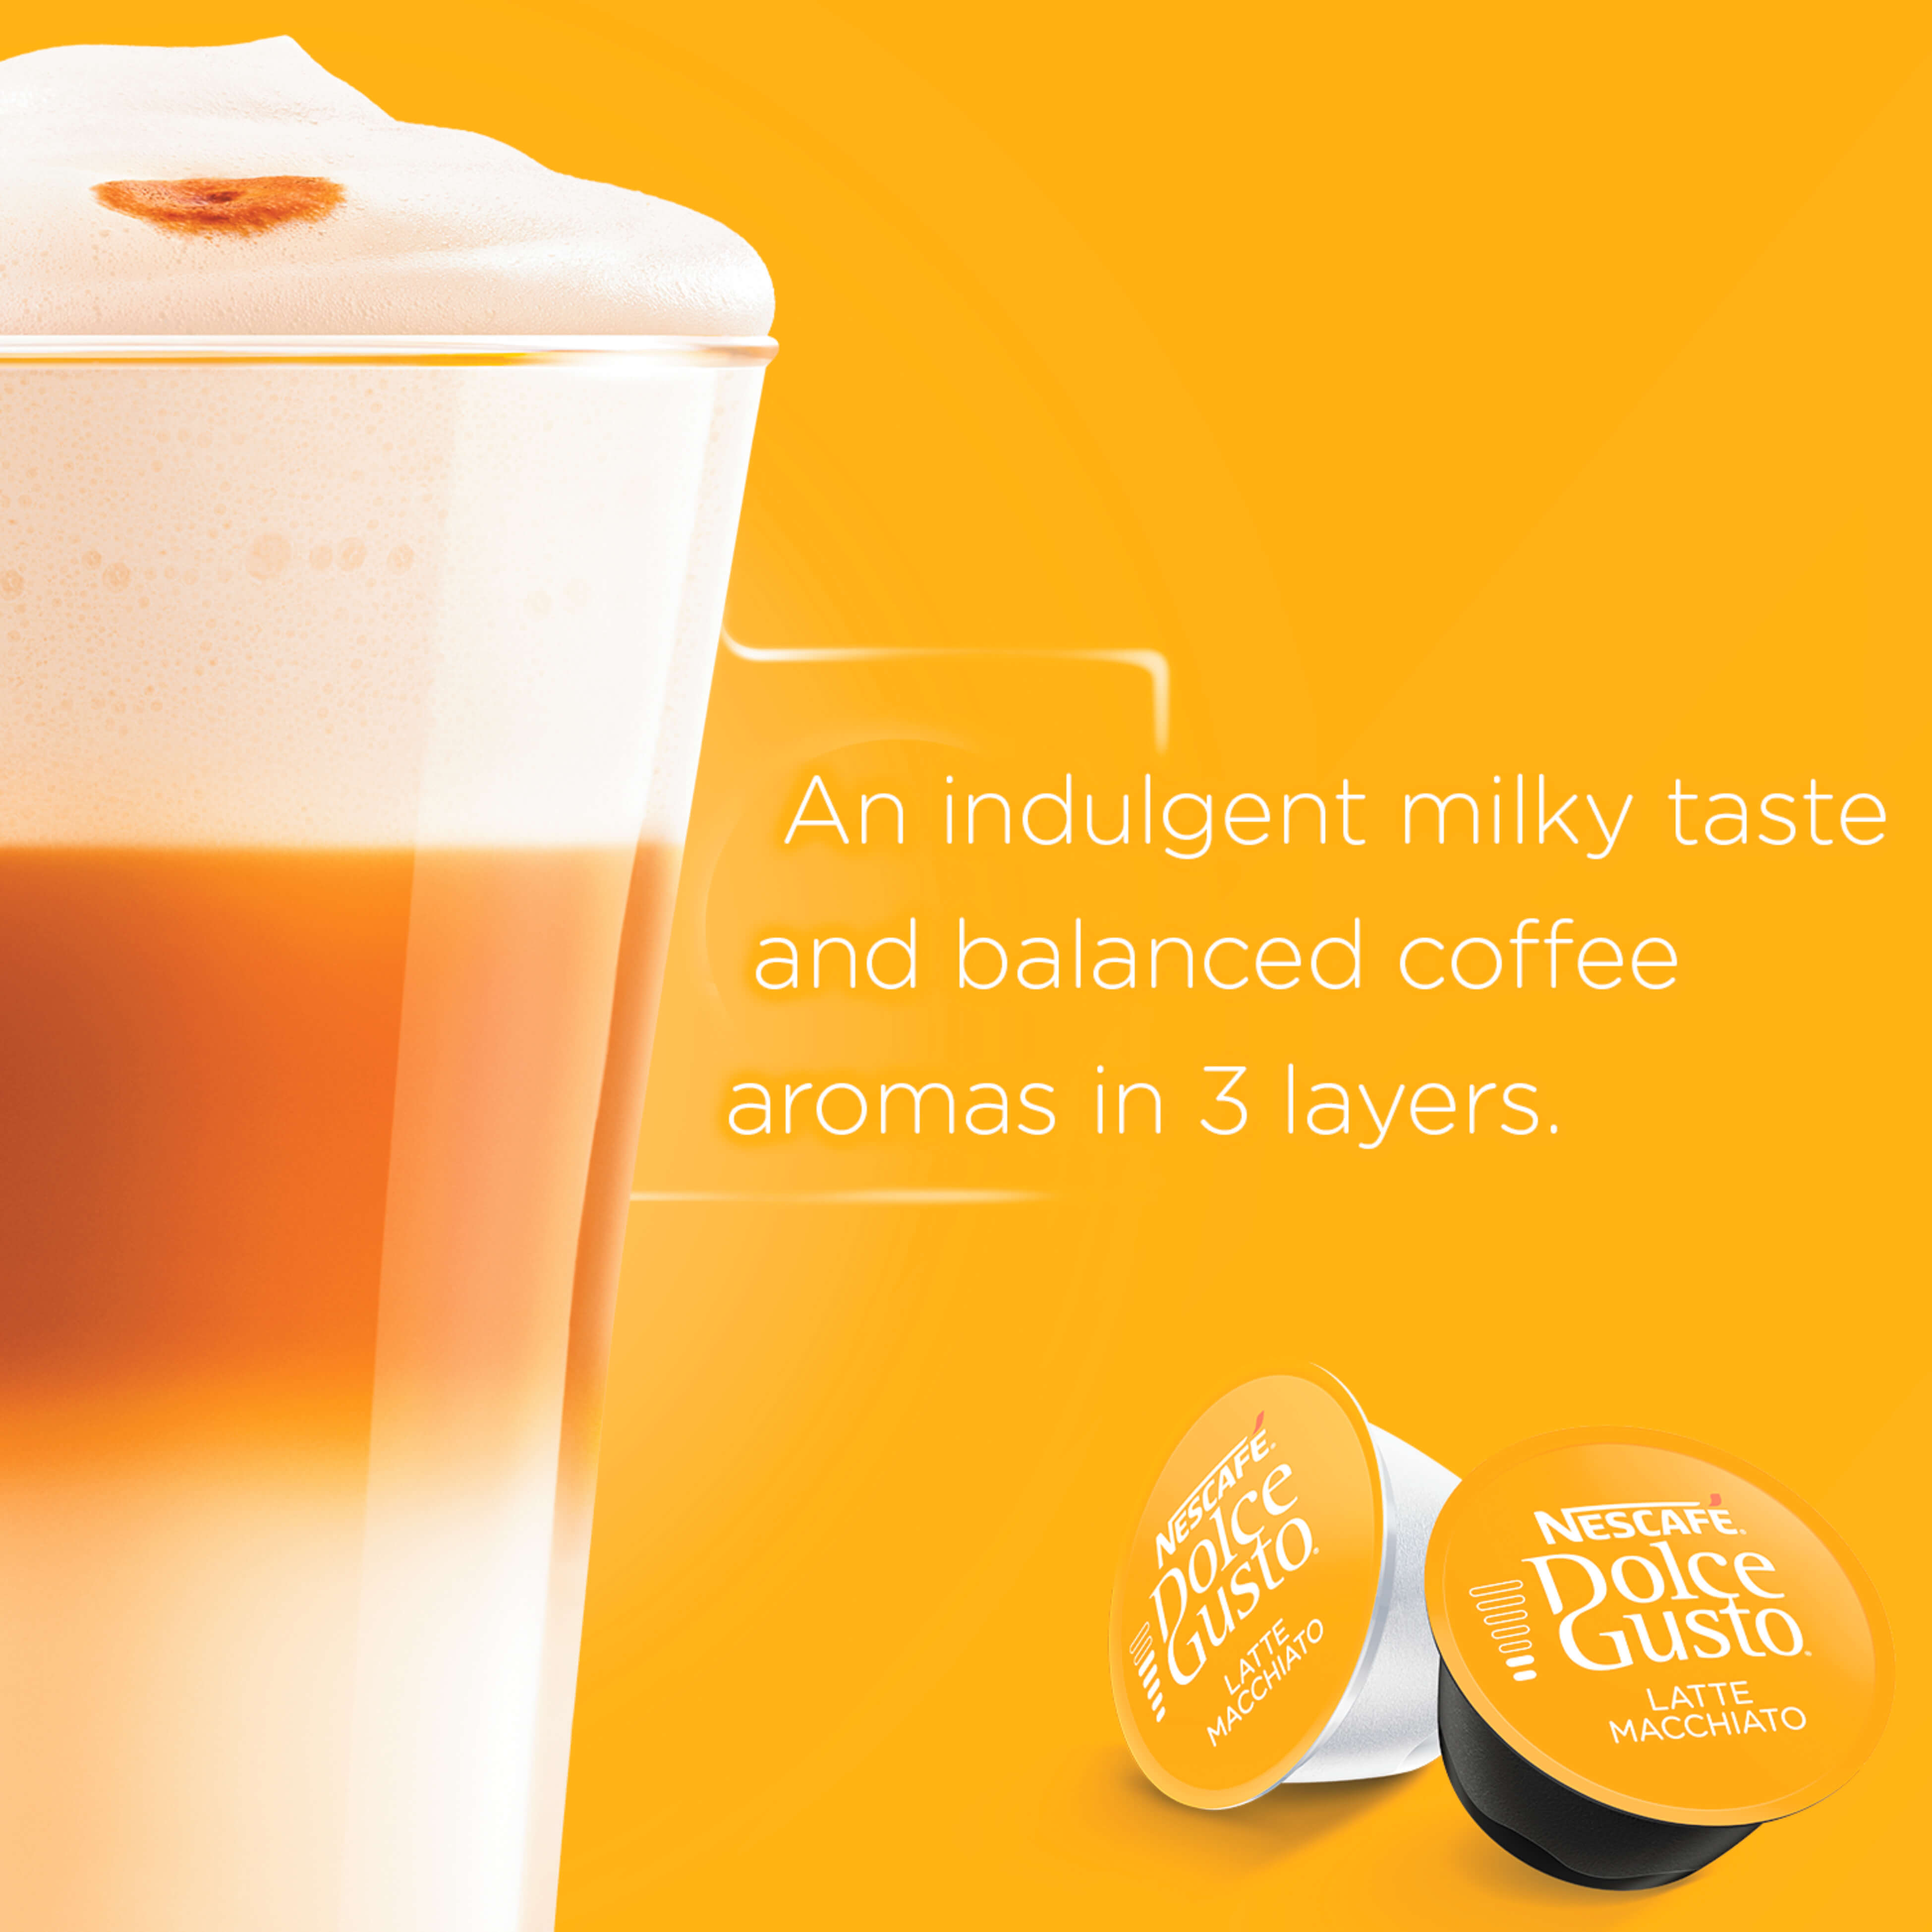 NESCAFE Dolce Gusto Latte Macchiato Coffee 16 Capsules x 2 boxes, Free Starter Kits